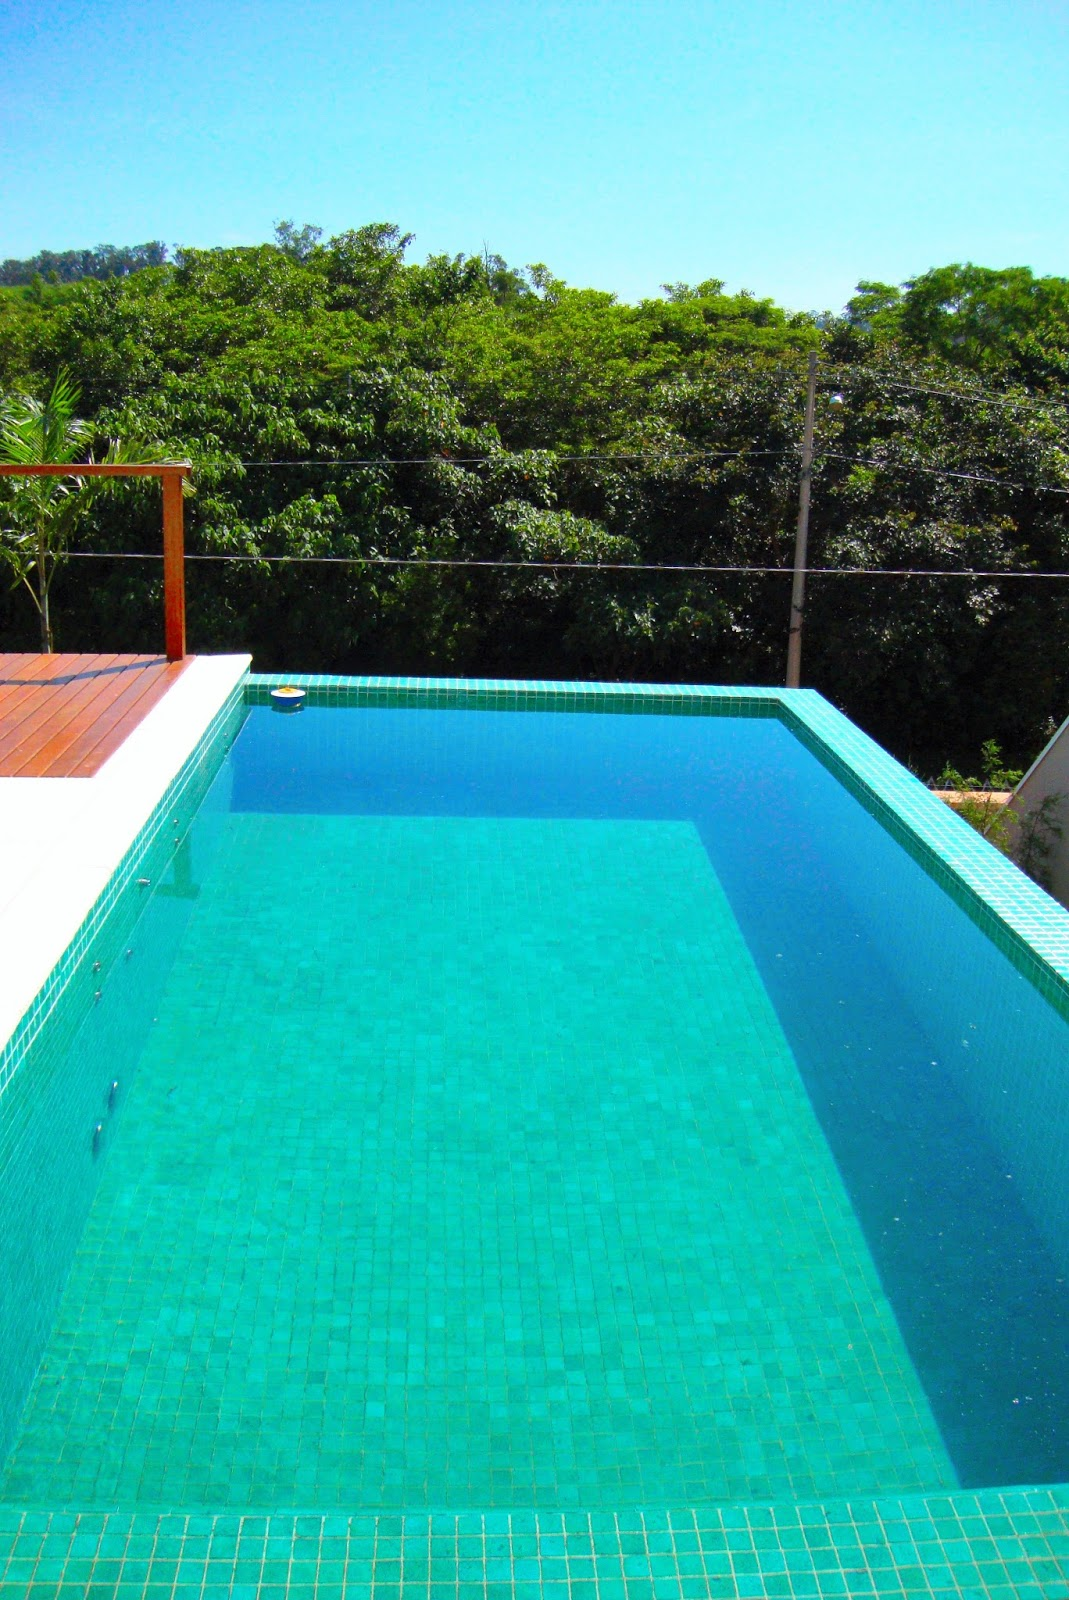 Casa alphaville dom pedro magn fica piscina com - Piscina gresite verde ...